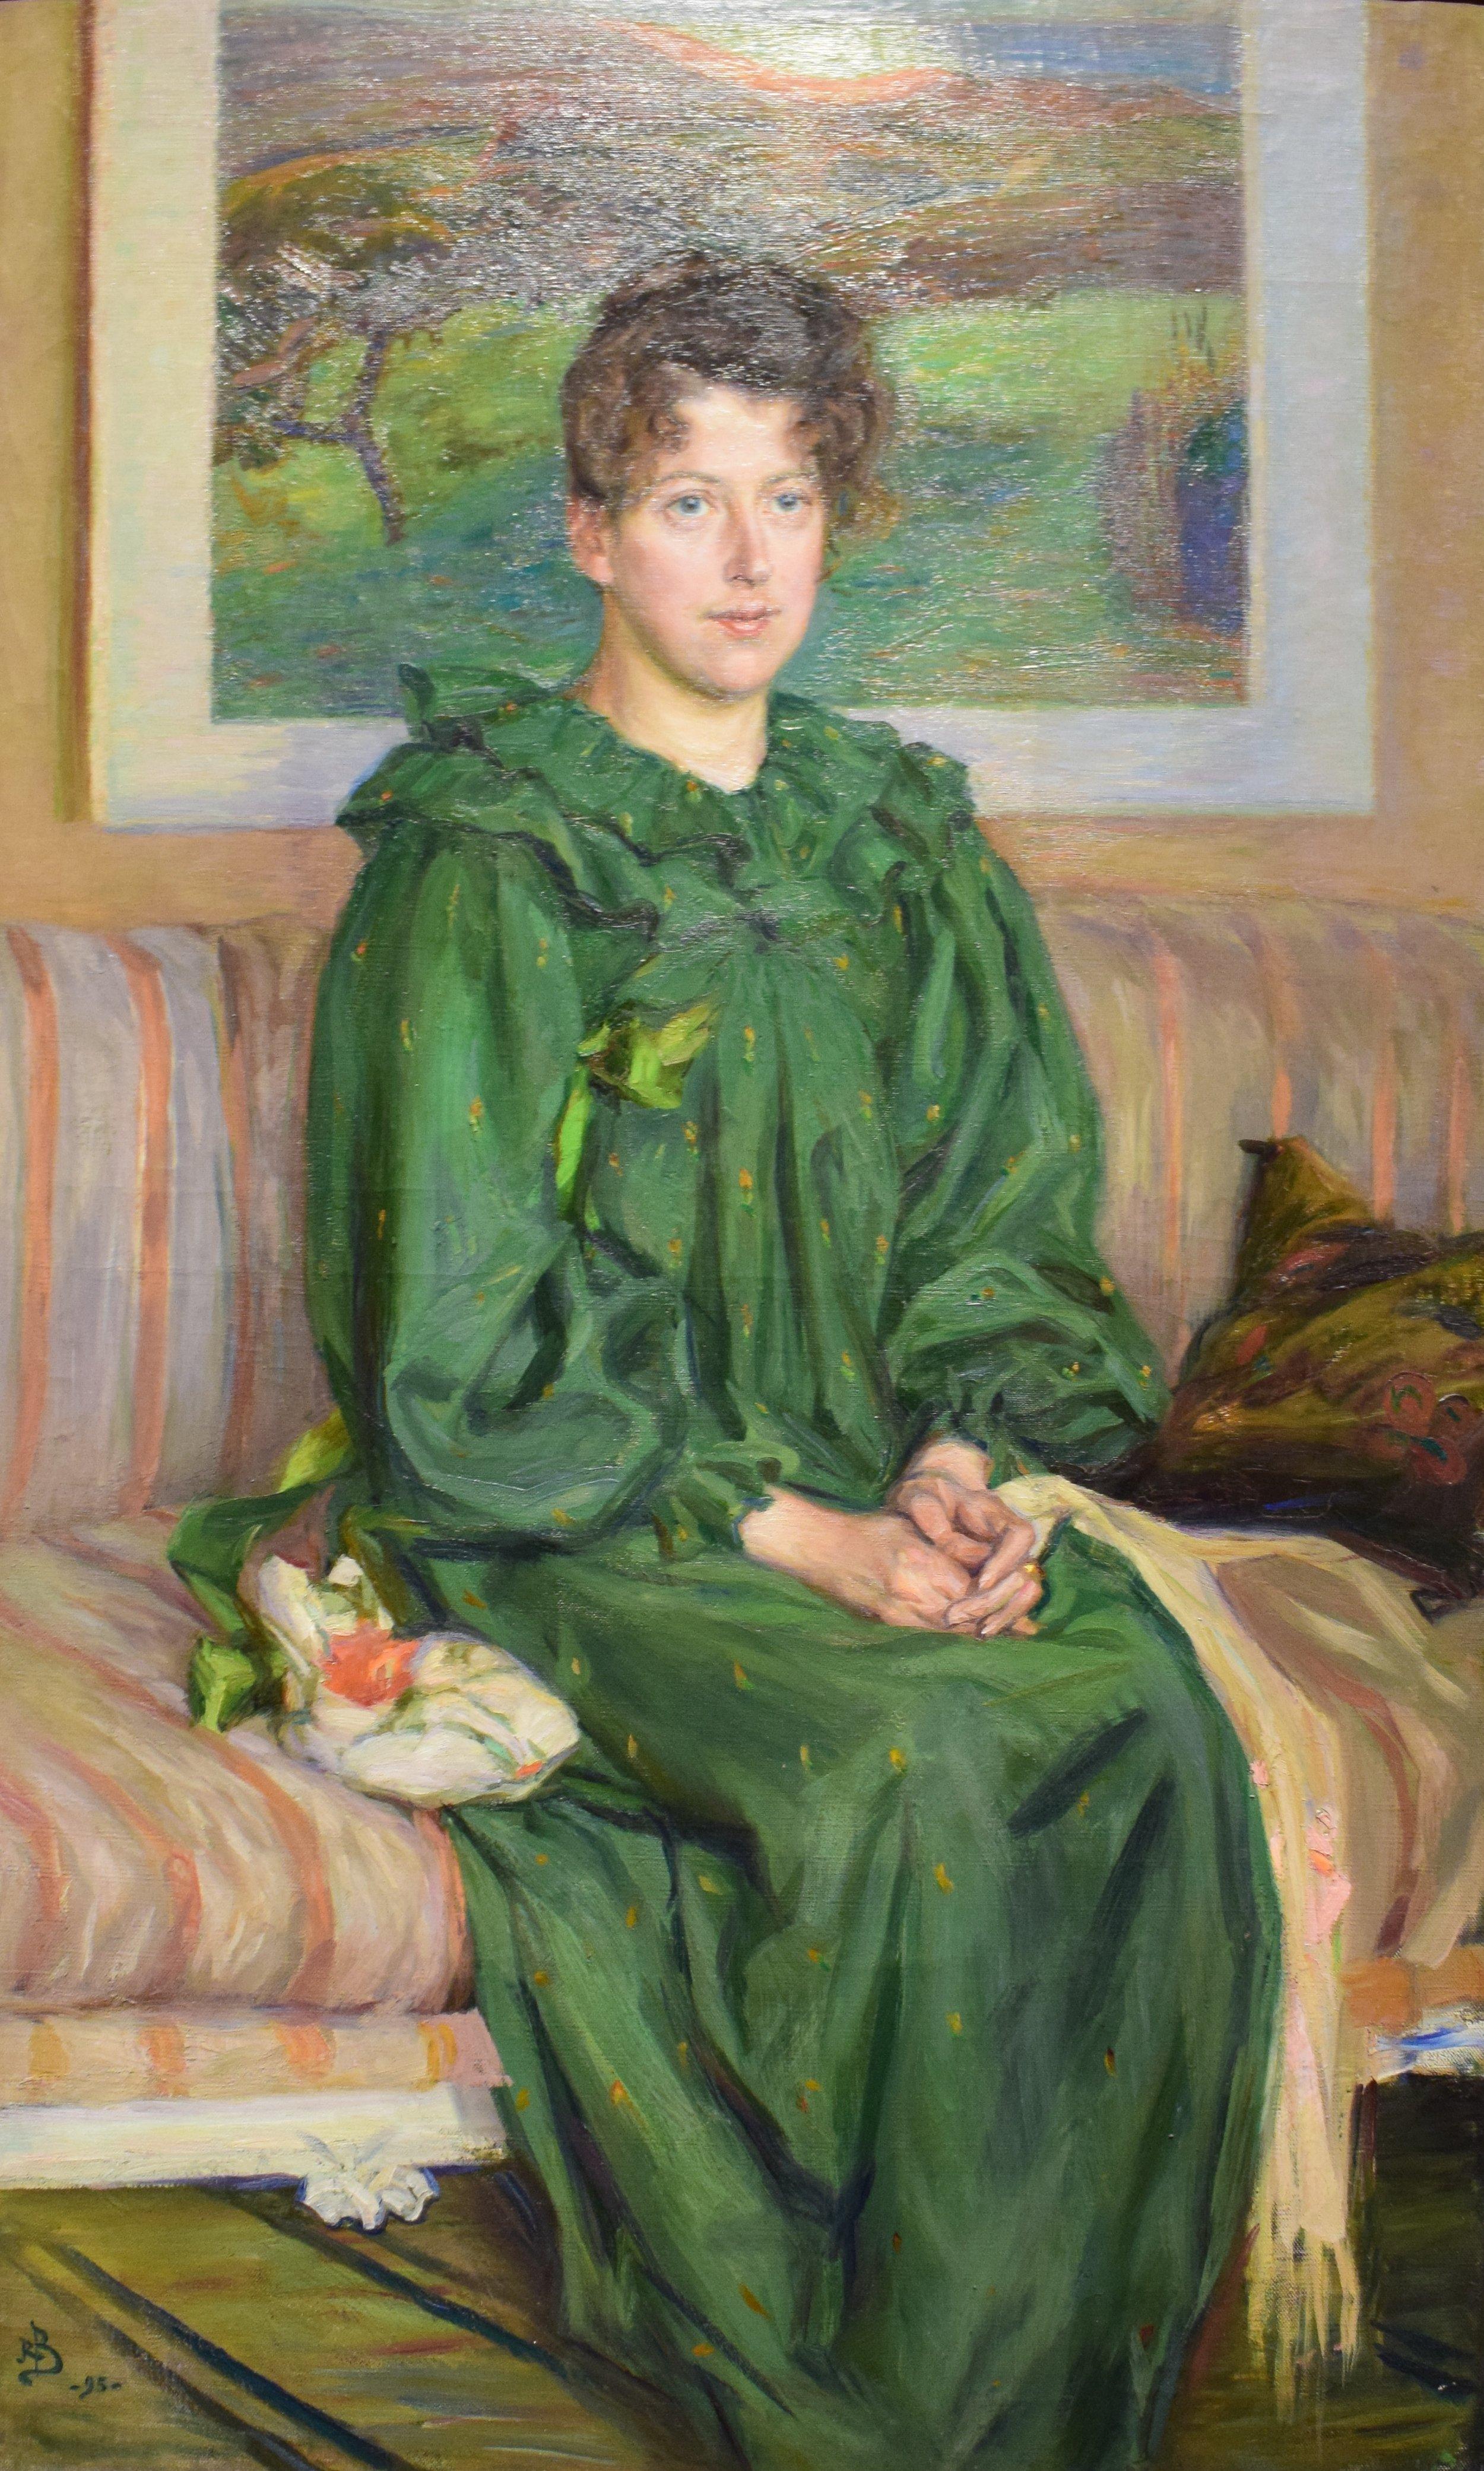 Richard Bergh, Portrait of Gerda, 1895, Nasjonalmuseet